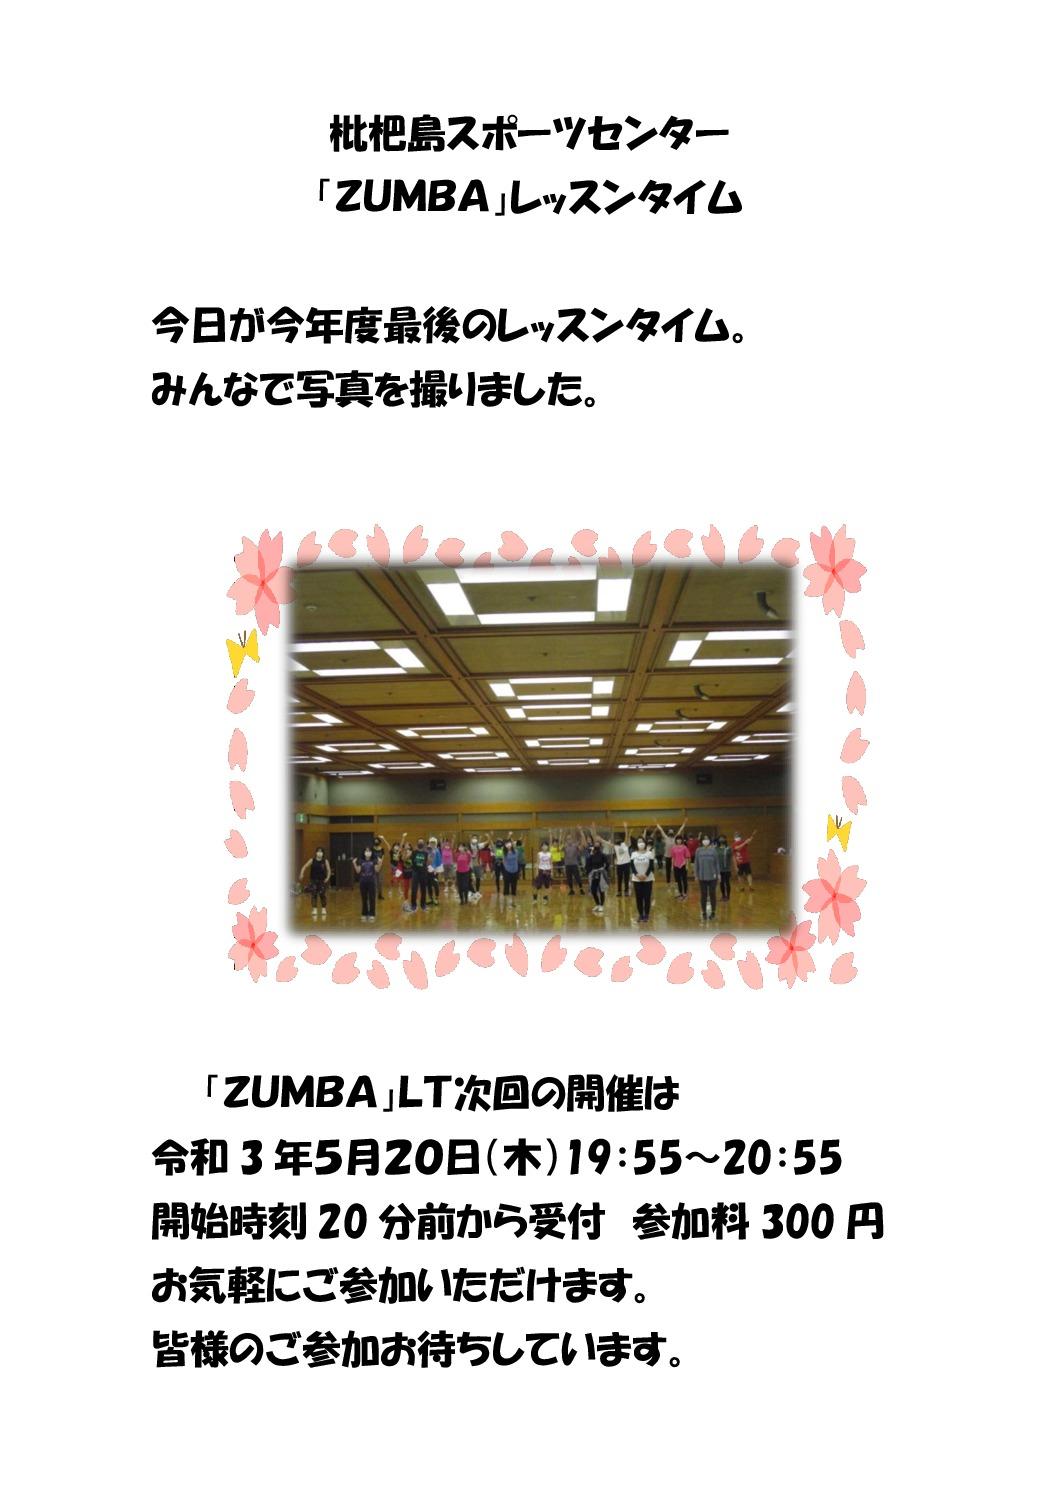 thumbnail of ZUMBA 集合写真3月